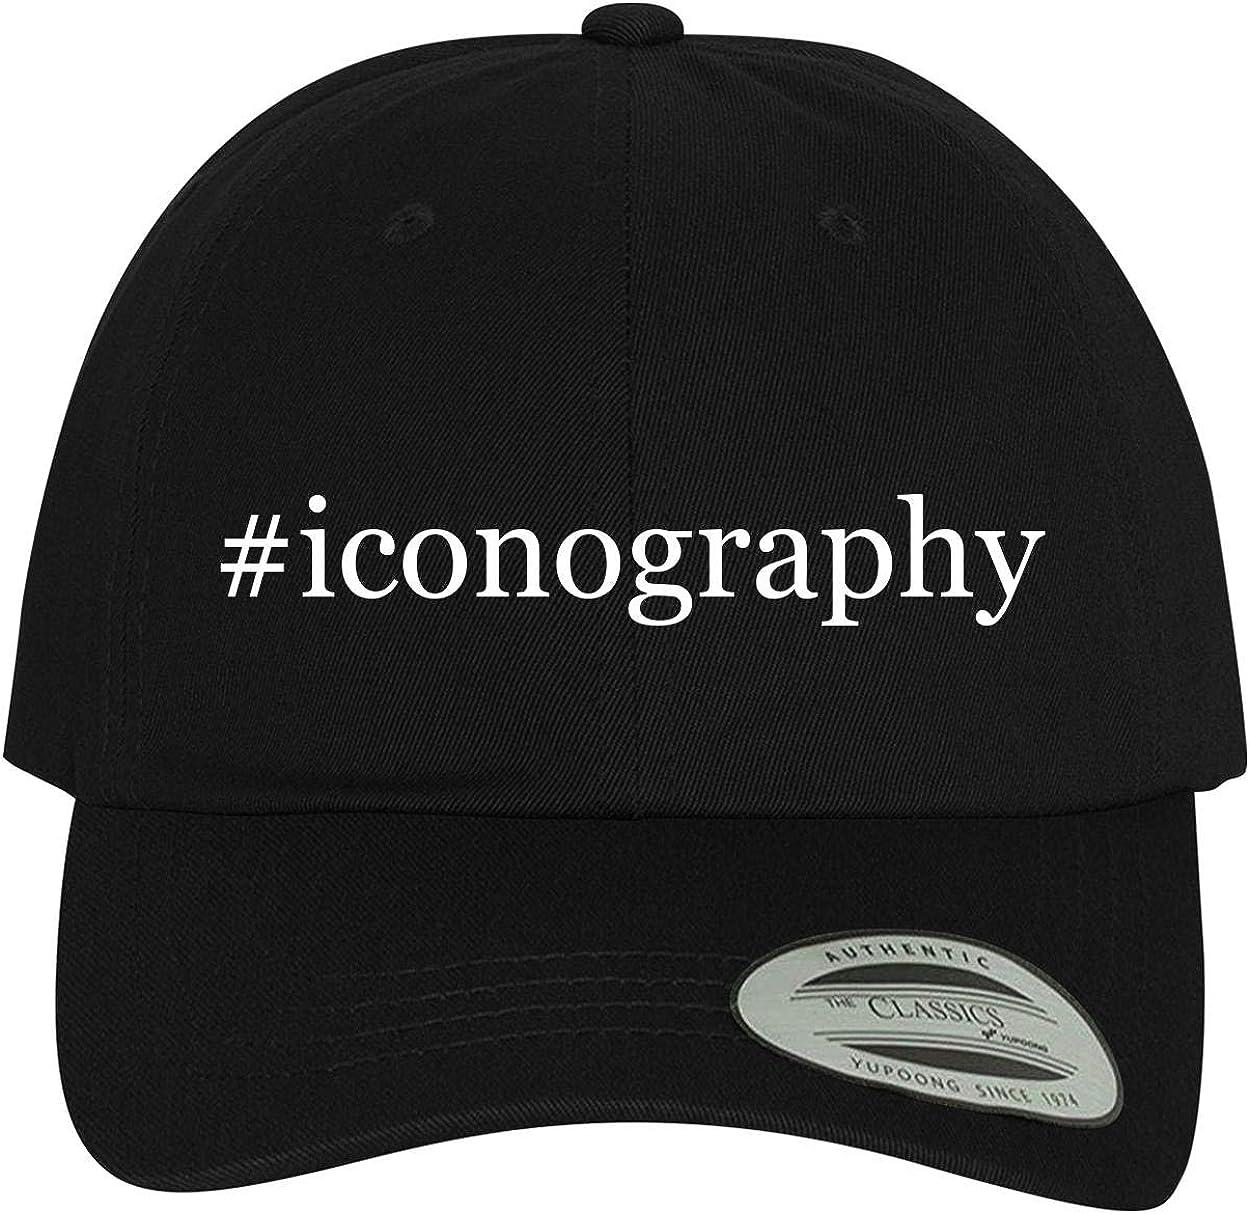 Comfortable Dad Hat Baseball Cap BH Cool Designs #Iconography